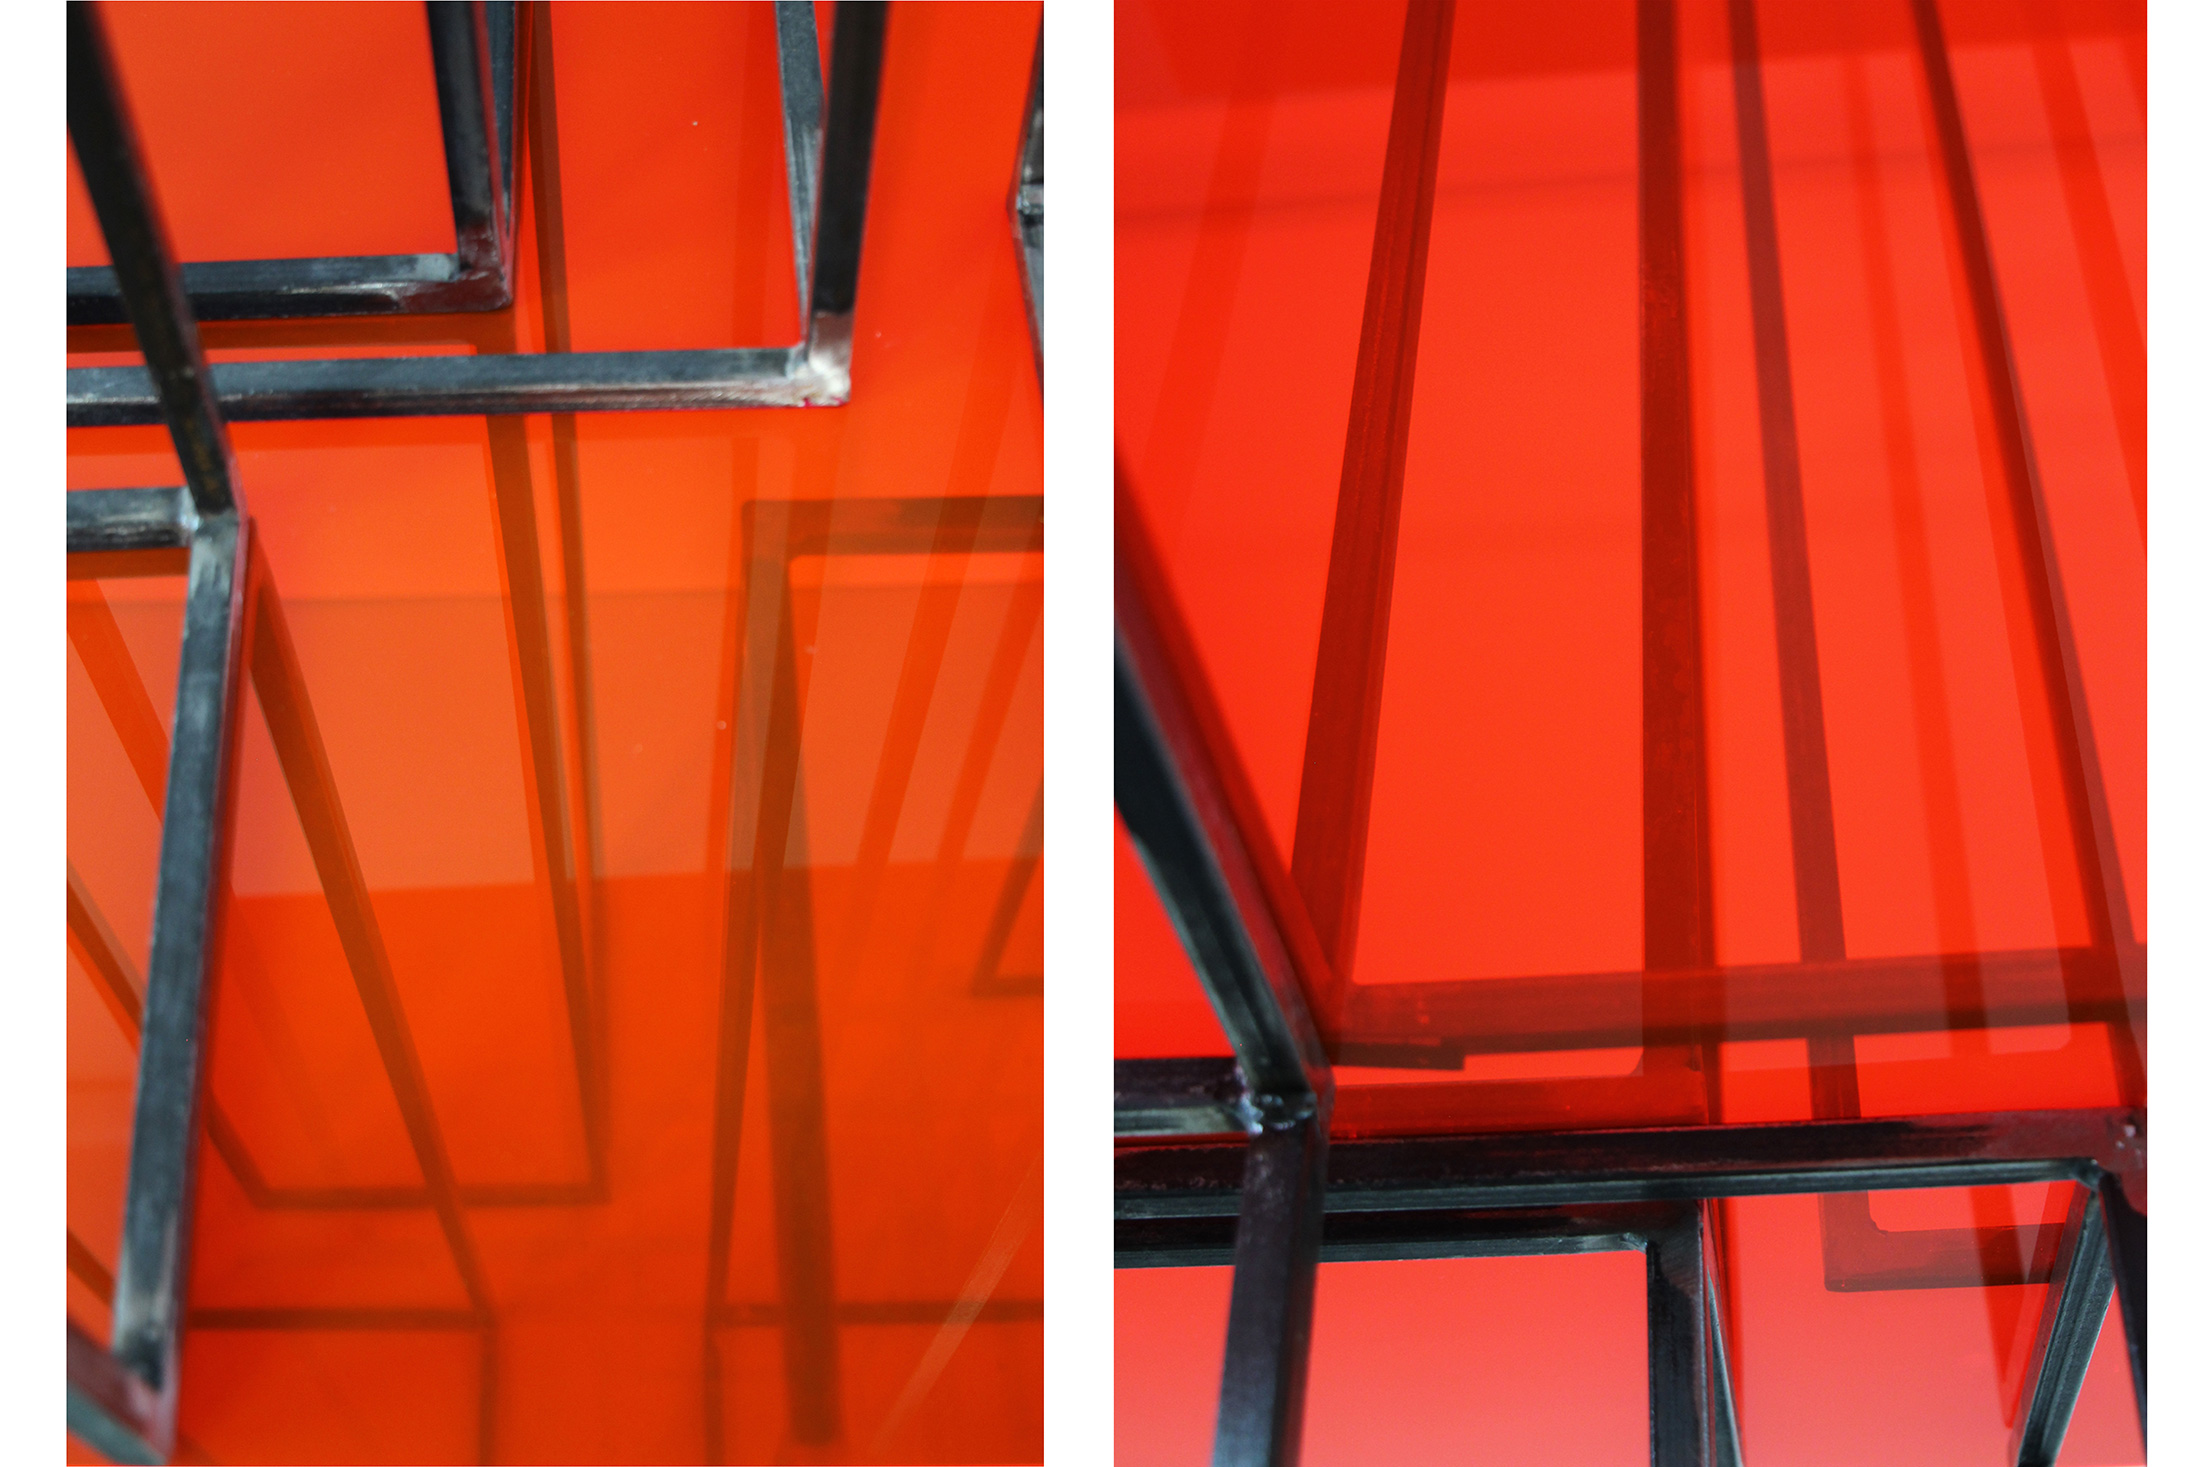 translucide  V |2021 | Beton, Acrylglas , Metall | 60 x 80 x 220 cm